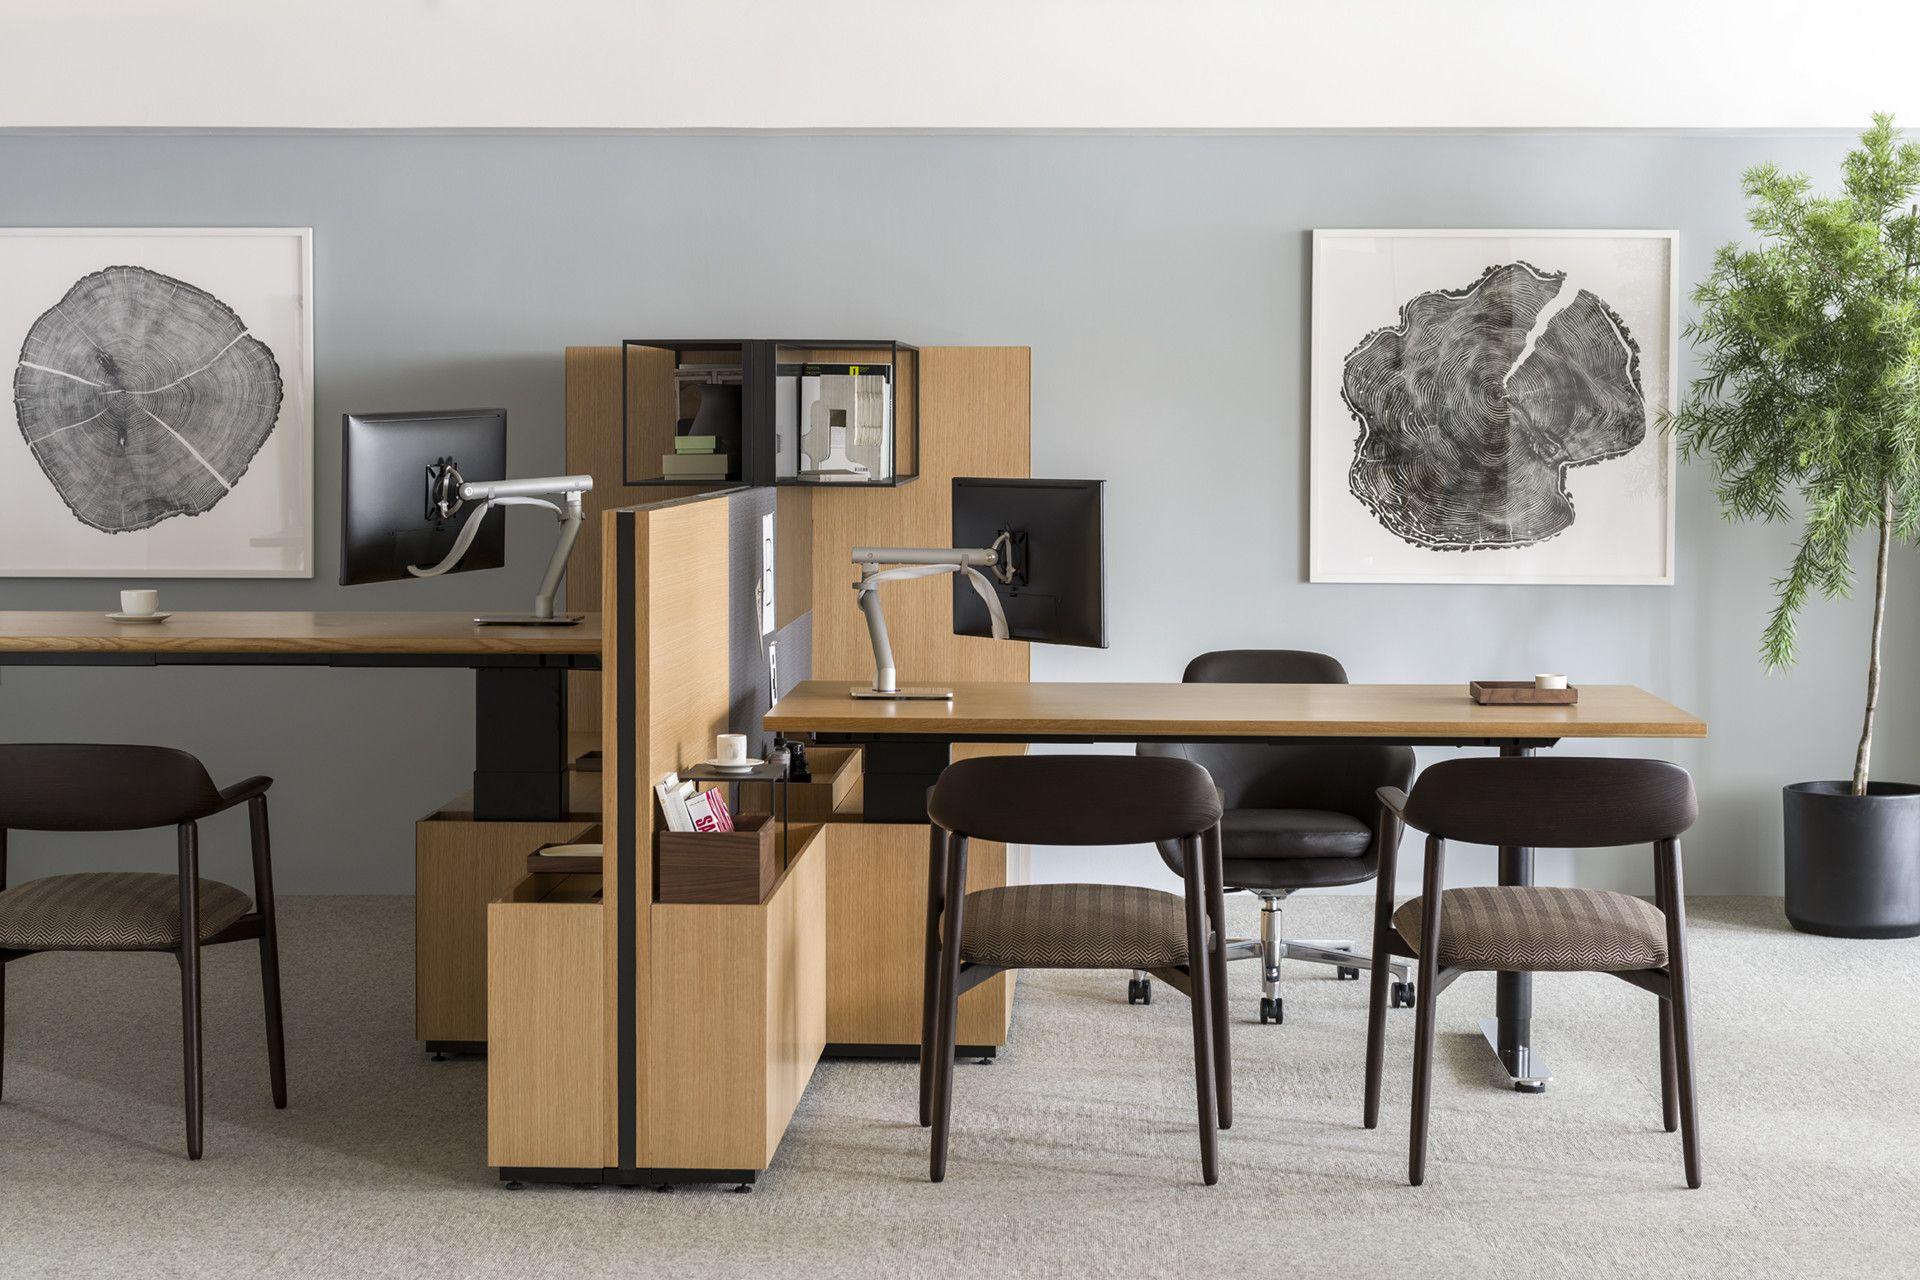 Rhythm Wood Casegoods By Geiger Furniture Half Inch Thickness Walls